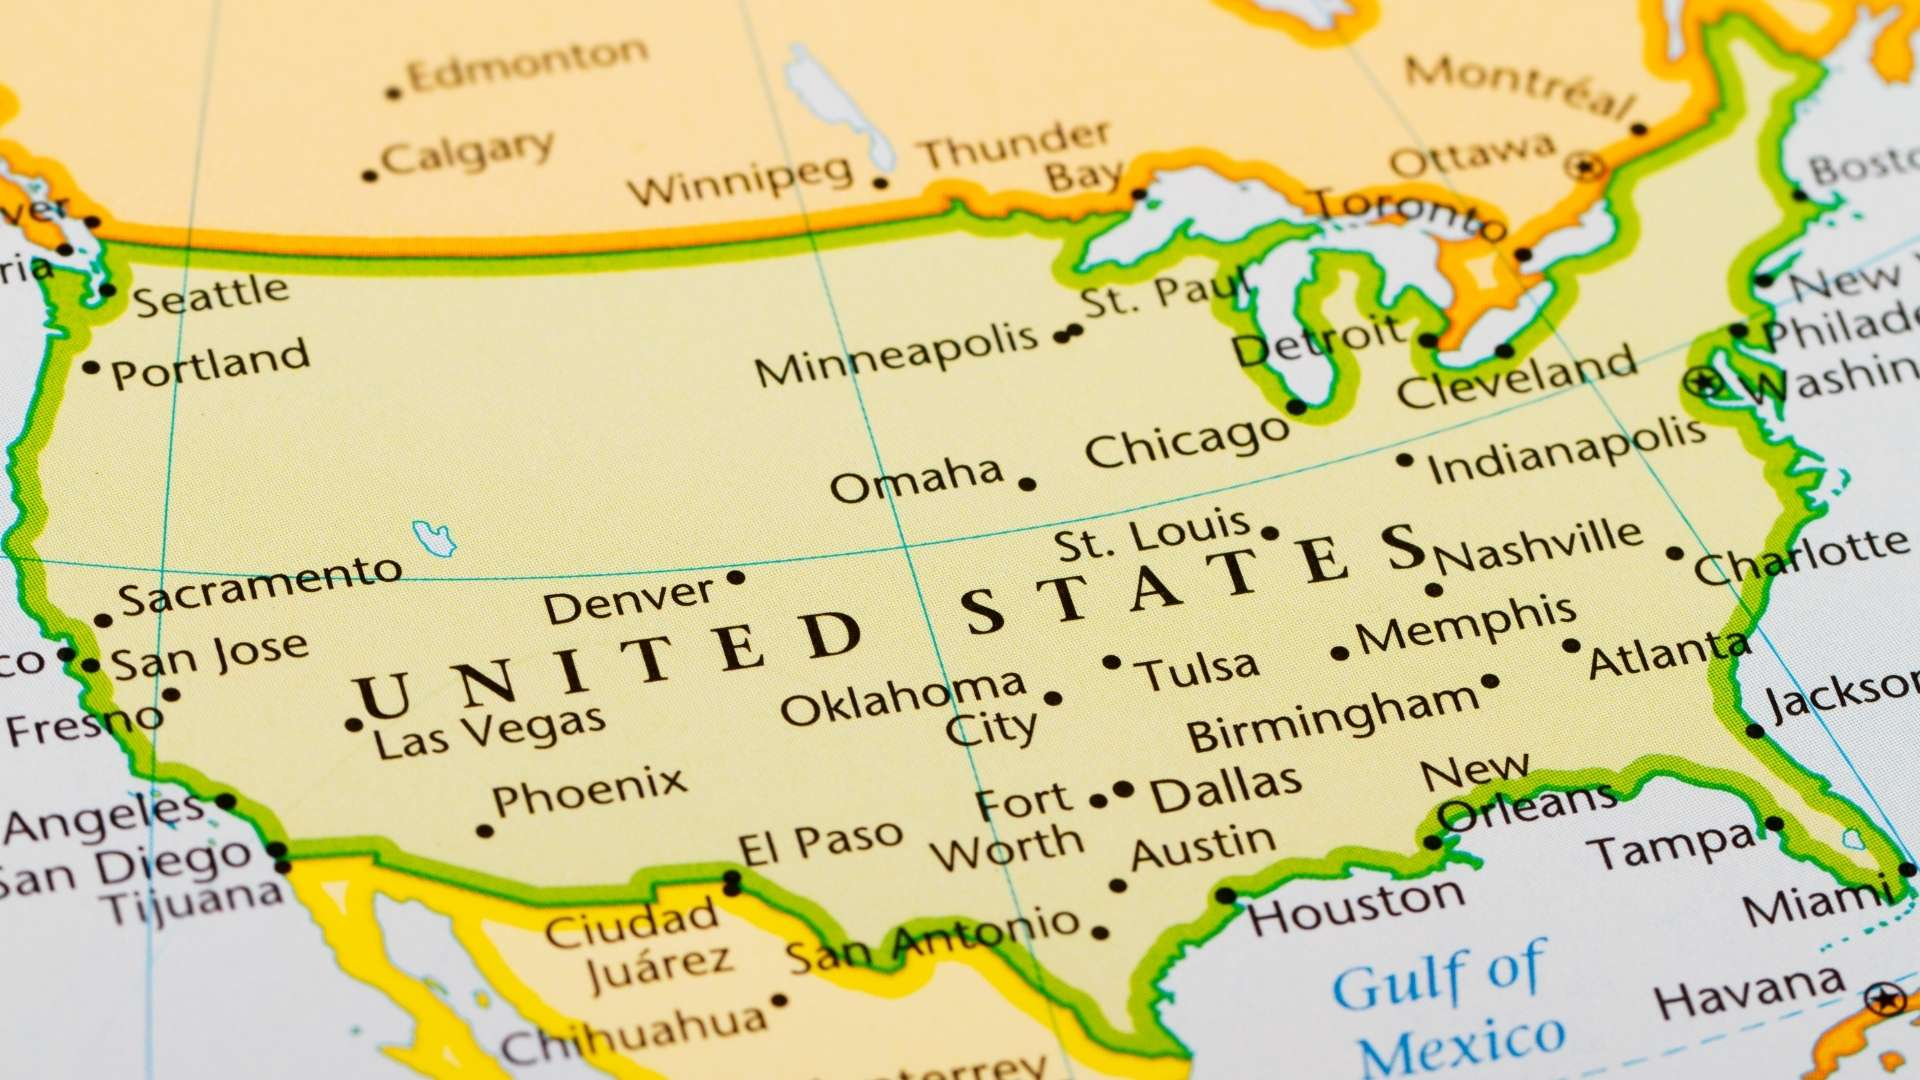 United_States_Map_1920x1080.jpg